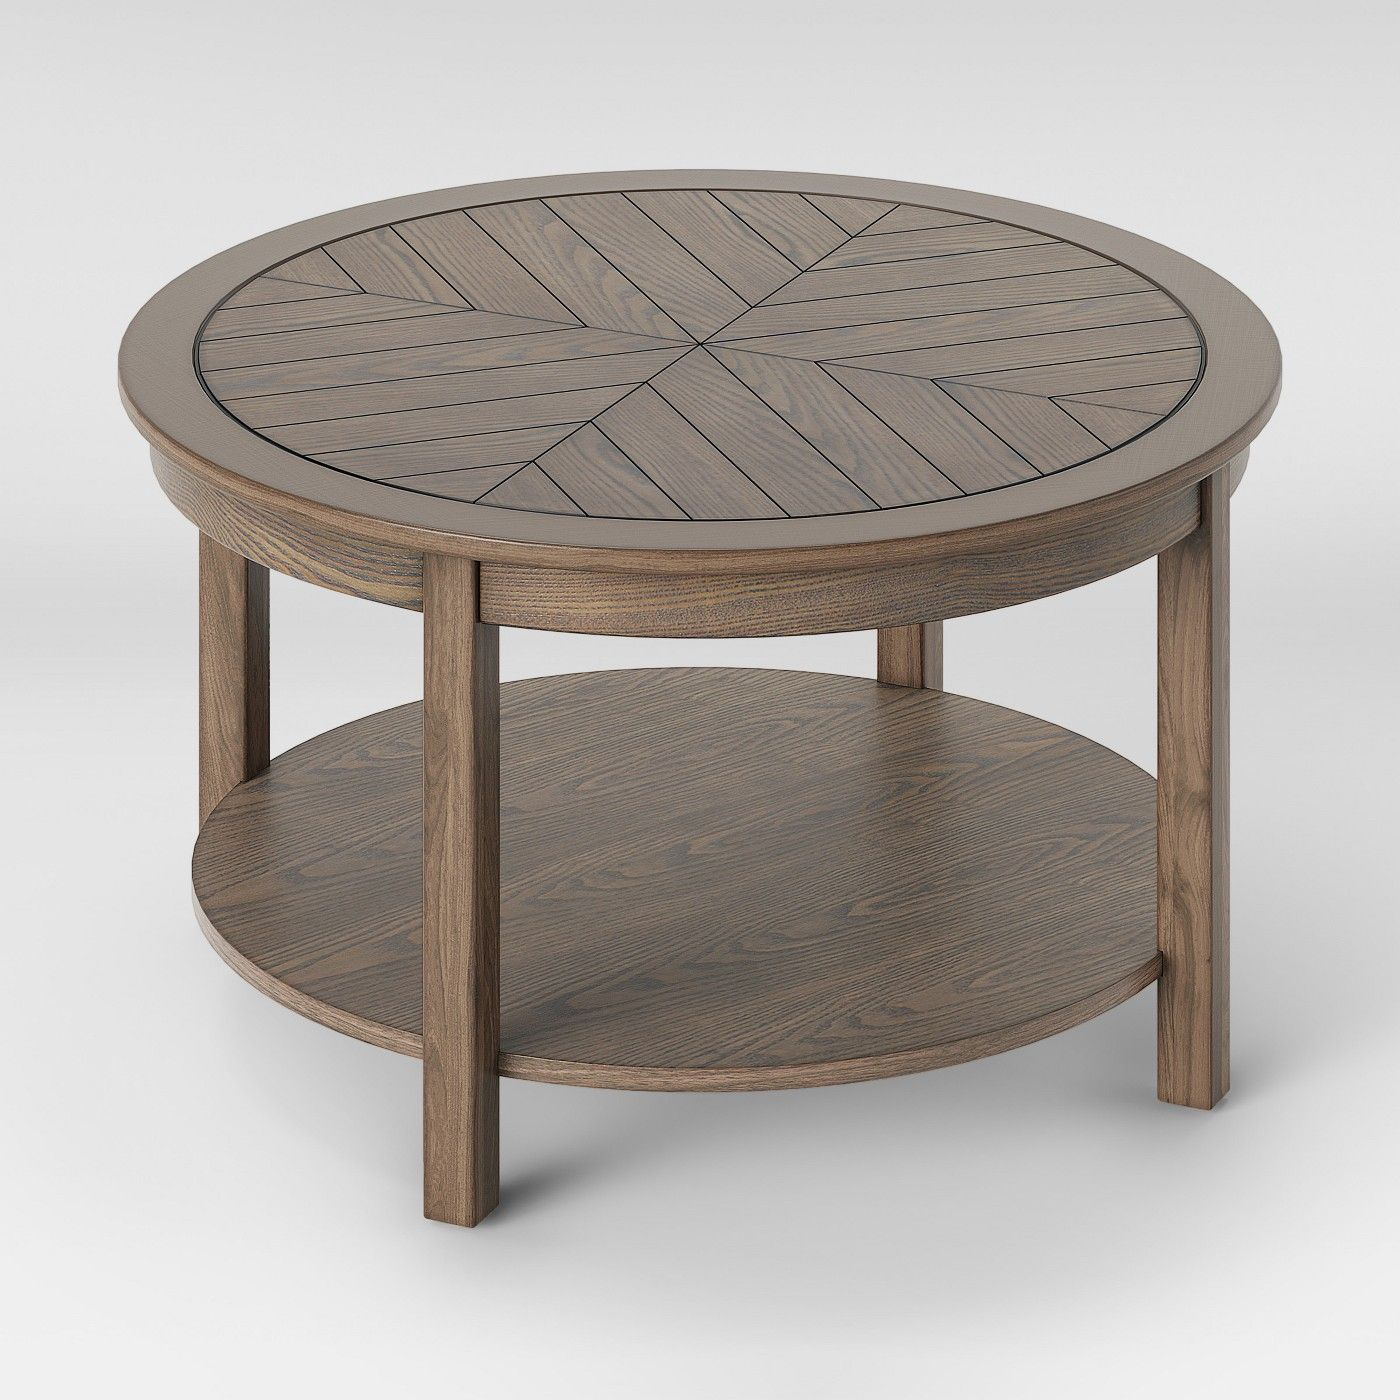 Eastford V Pattern Coffee Table Brown Threshold Image 3 Of 5 Trending Coffee Table Table Coffee Table [ 1400 x 1400 Pixel ]